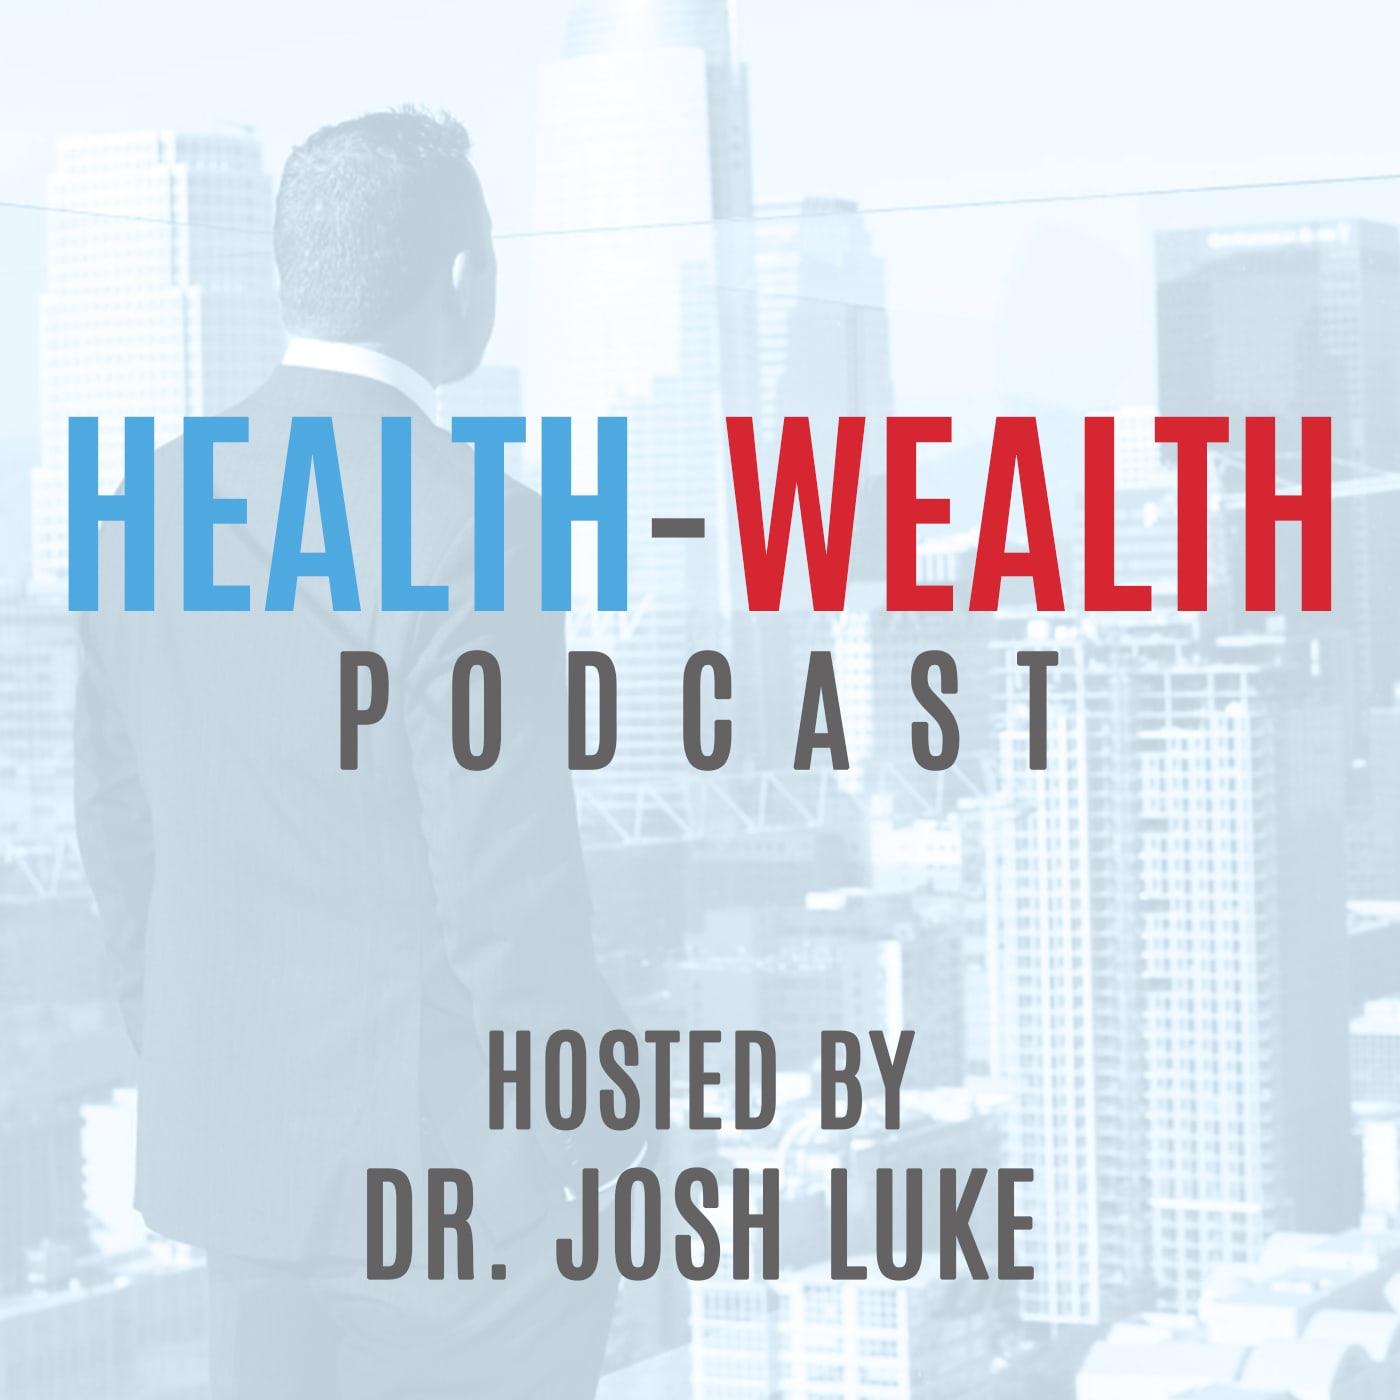 Health-Wealth Podcast: With Dr. Josh Luke show art